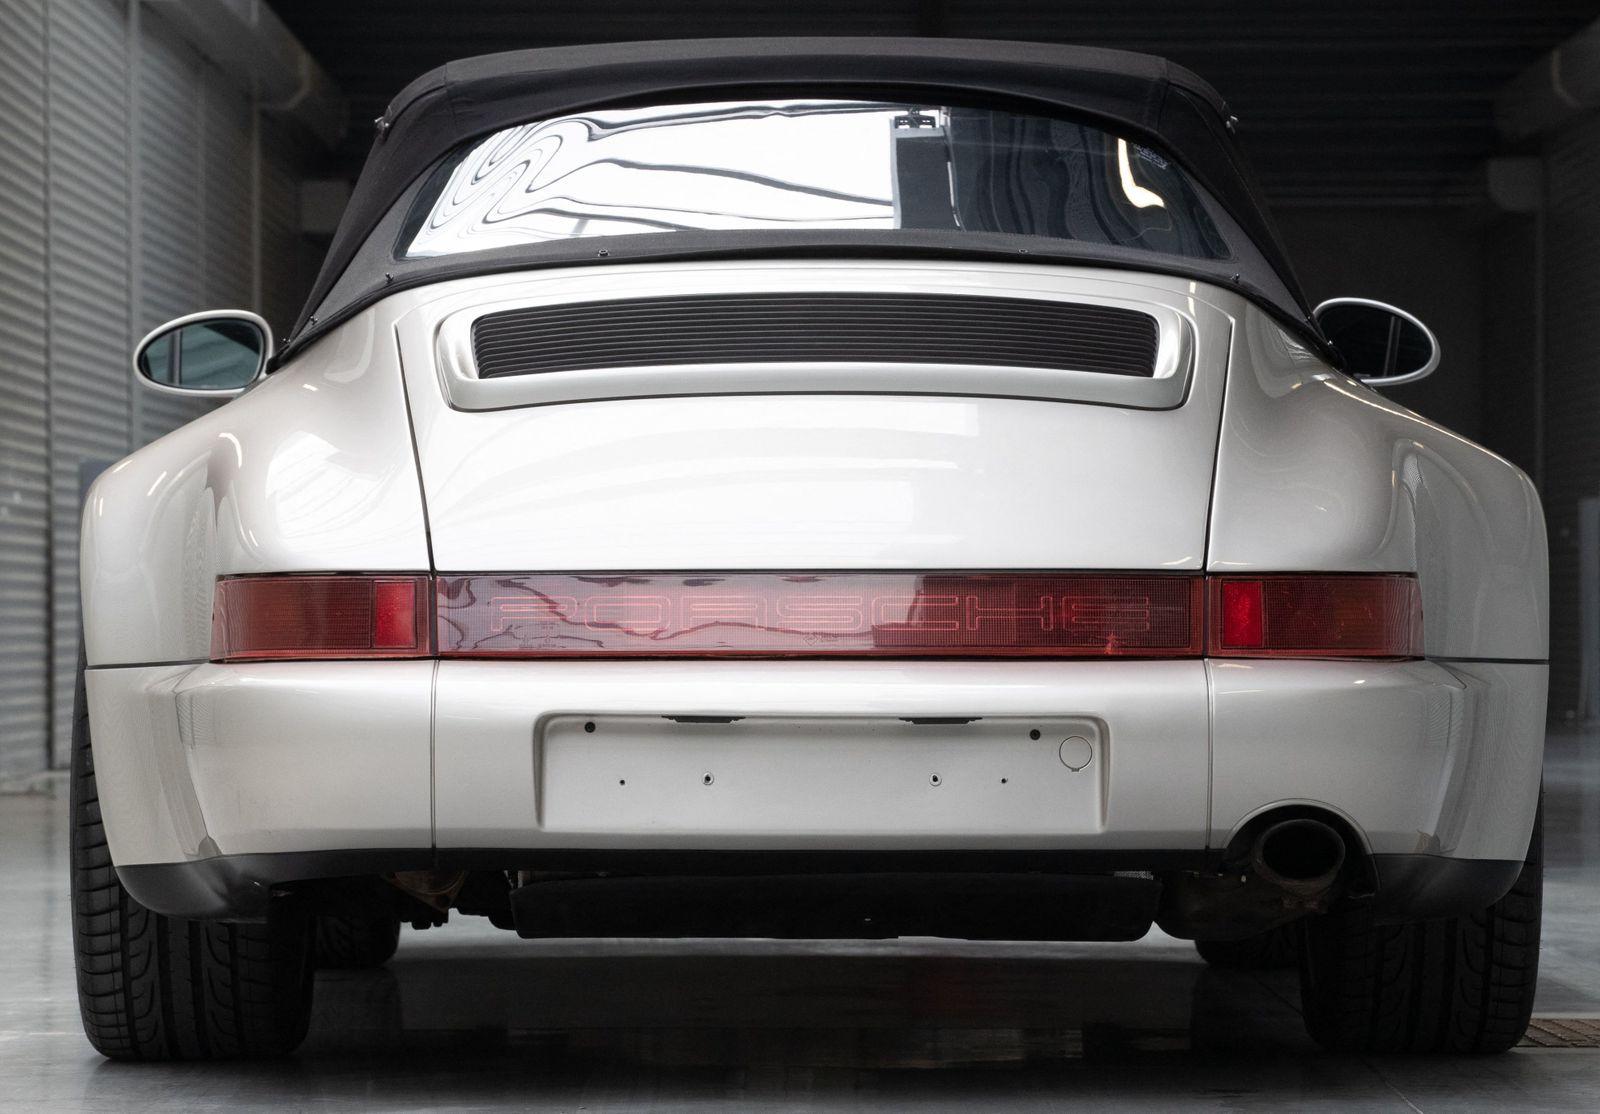 BELGIUM-AUCTION-CAR-MARADONA-PORSCHE